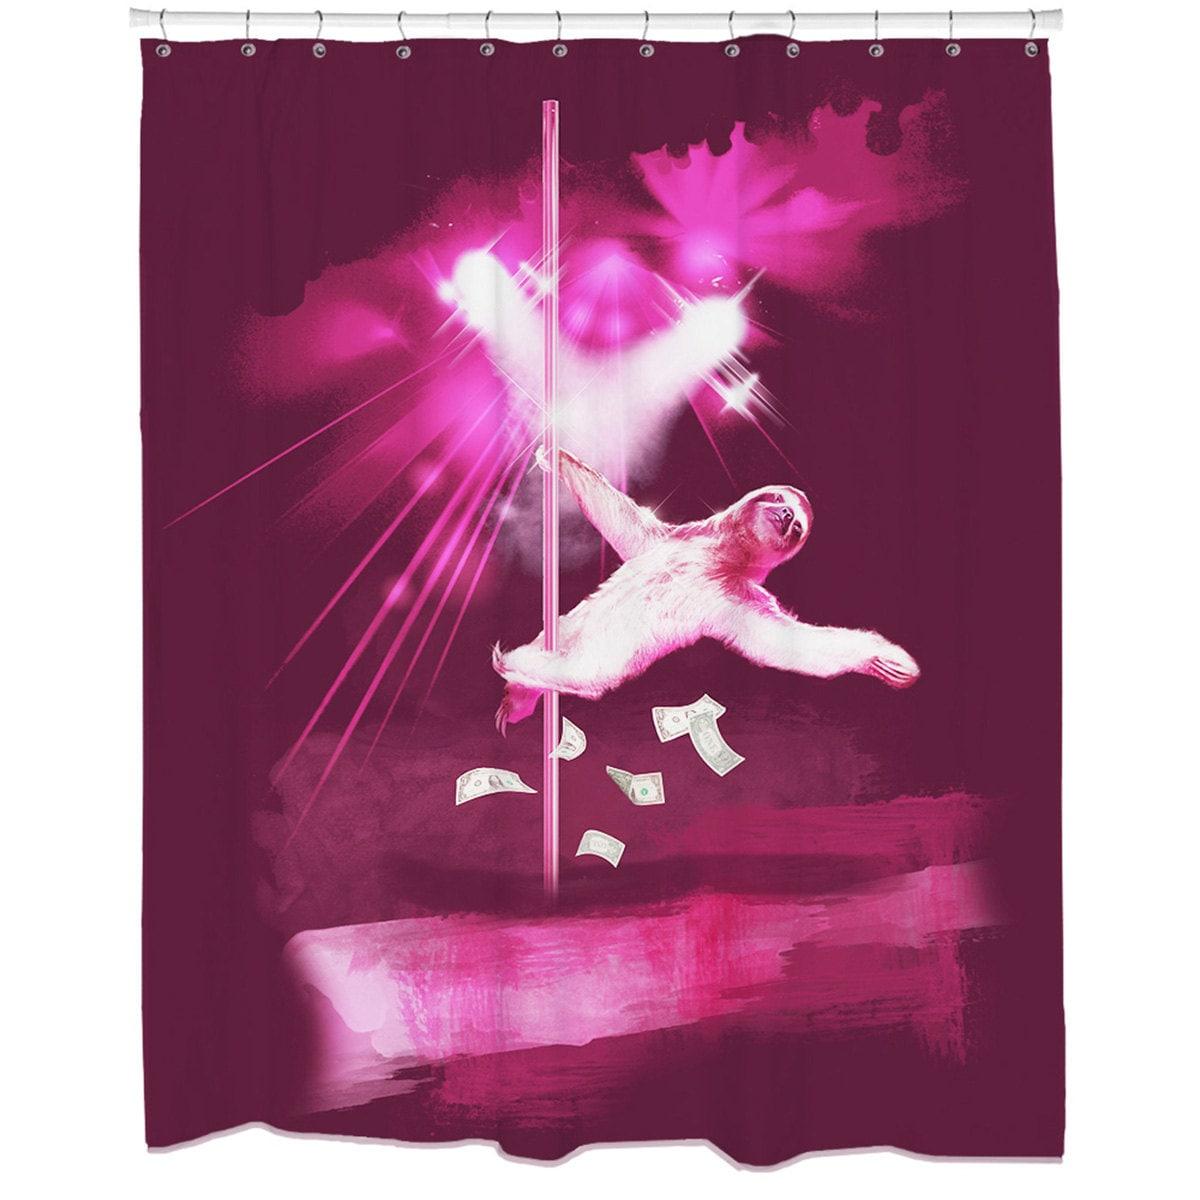 Sexy Shower Curtain Sloth Funny Bathroom